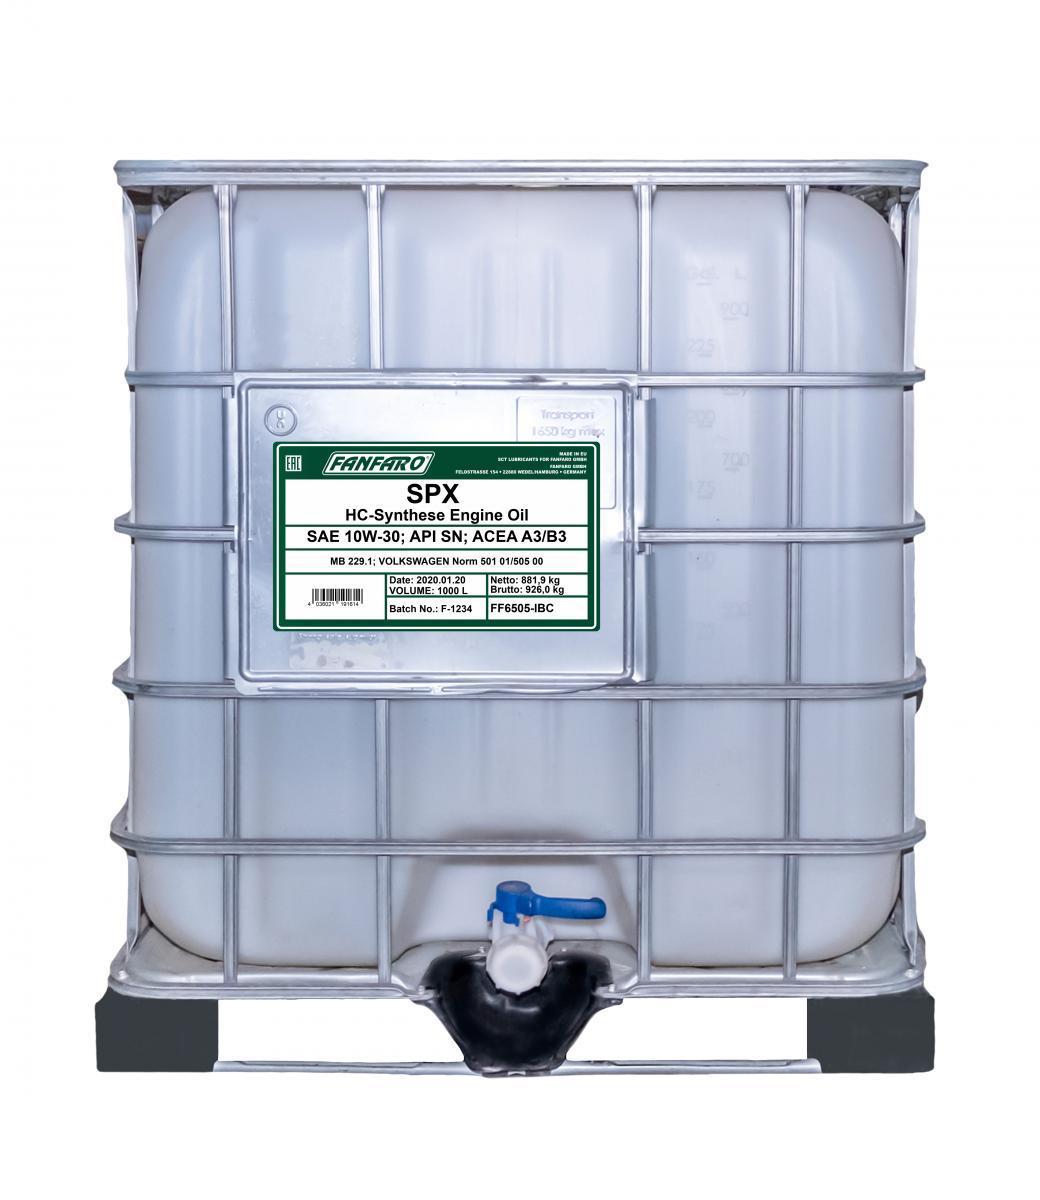 FF6505-IBC FANFARO Profi Line, SPX 10W-30, 1000l, Teilsynthetiköl Motoröl FF6505-IBC günstig kaufen